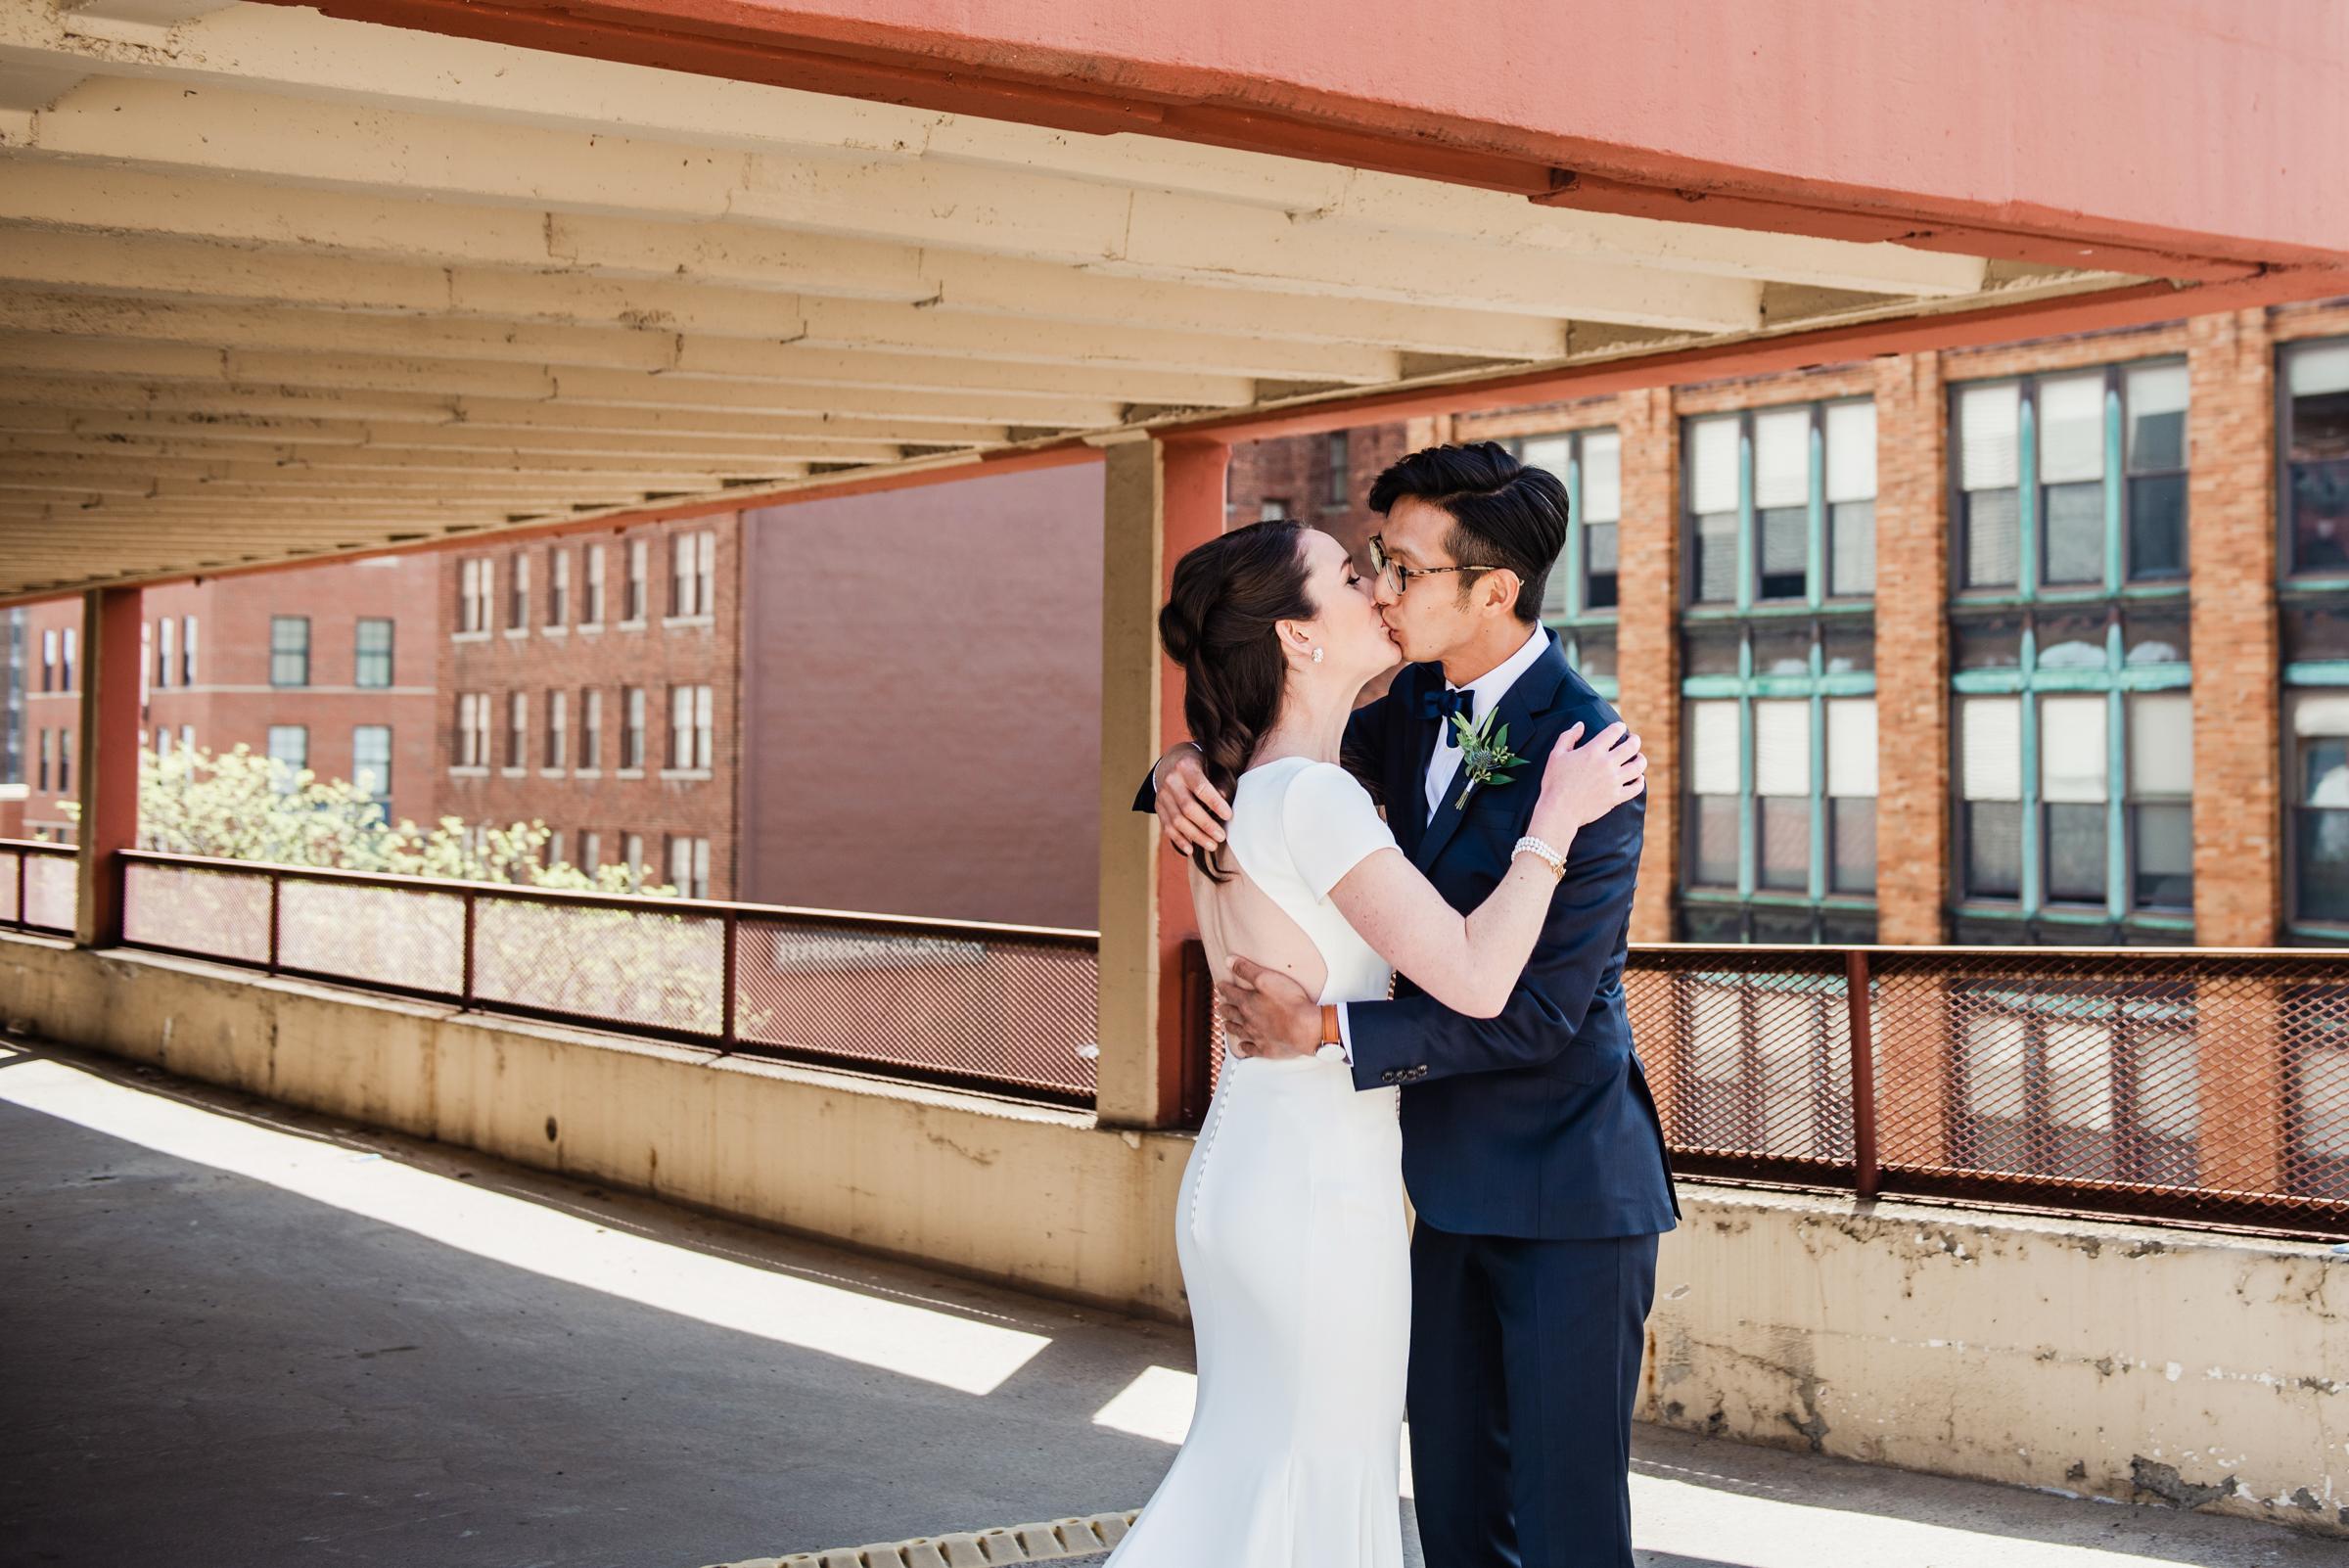 SKY_Armory_Syracuse_Wedding_JILL_STUDIO_Rochester_NY_Photographer_DSC_5193.jpg